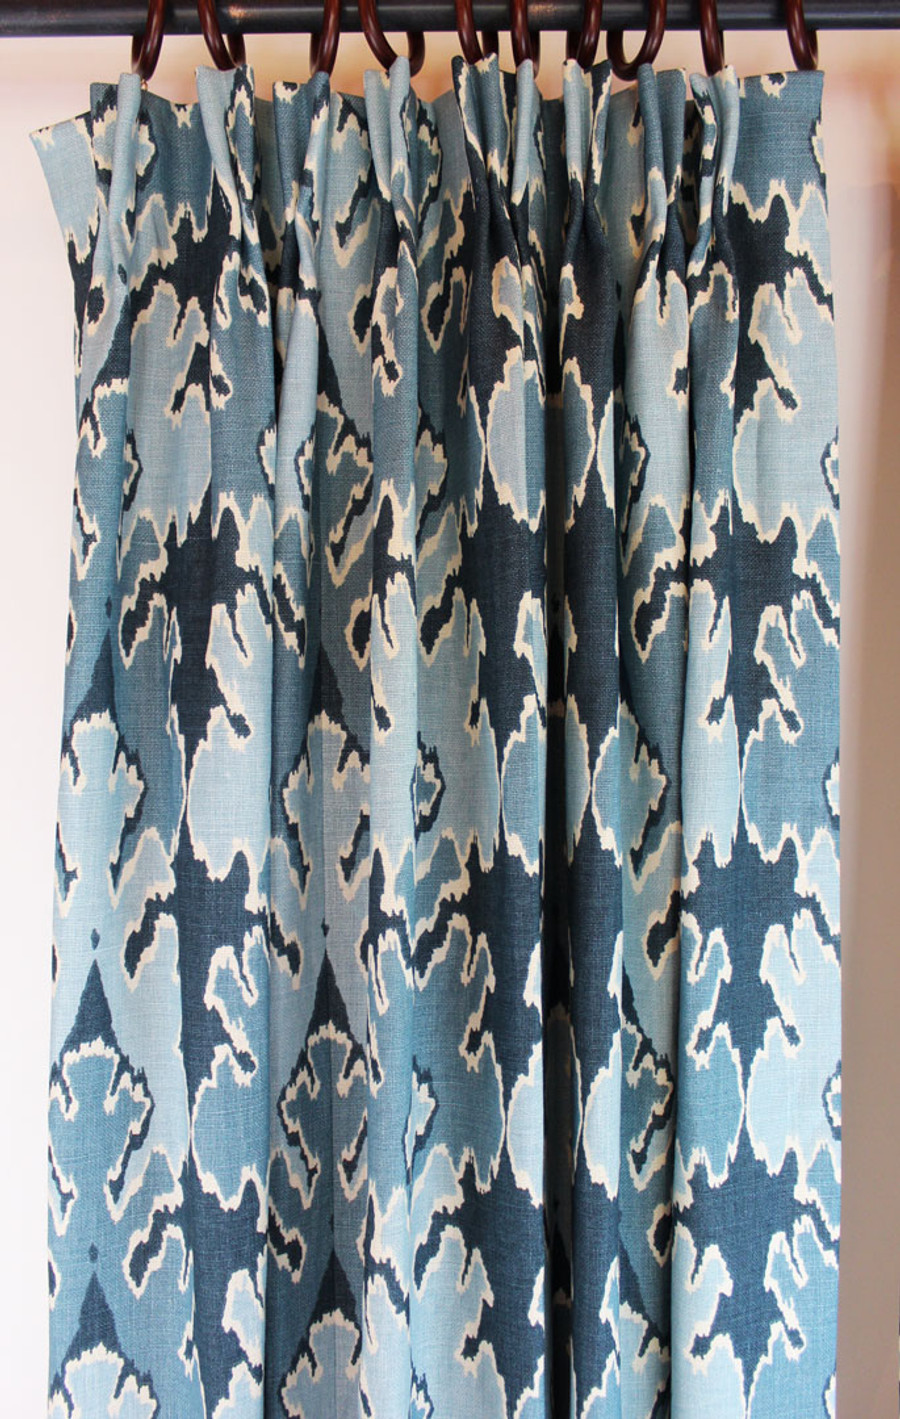 Custom Pleated Drapes by Lynn Chalk in Kelly Wearstler Bengal Bazaar in Teal